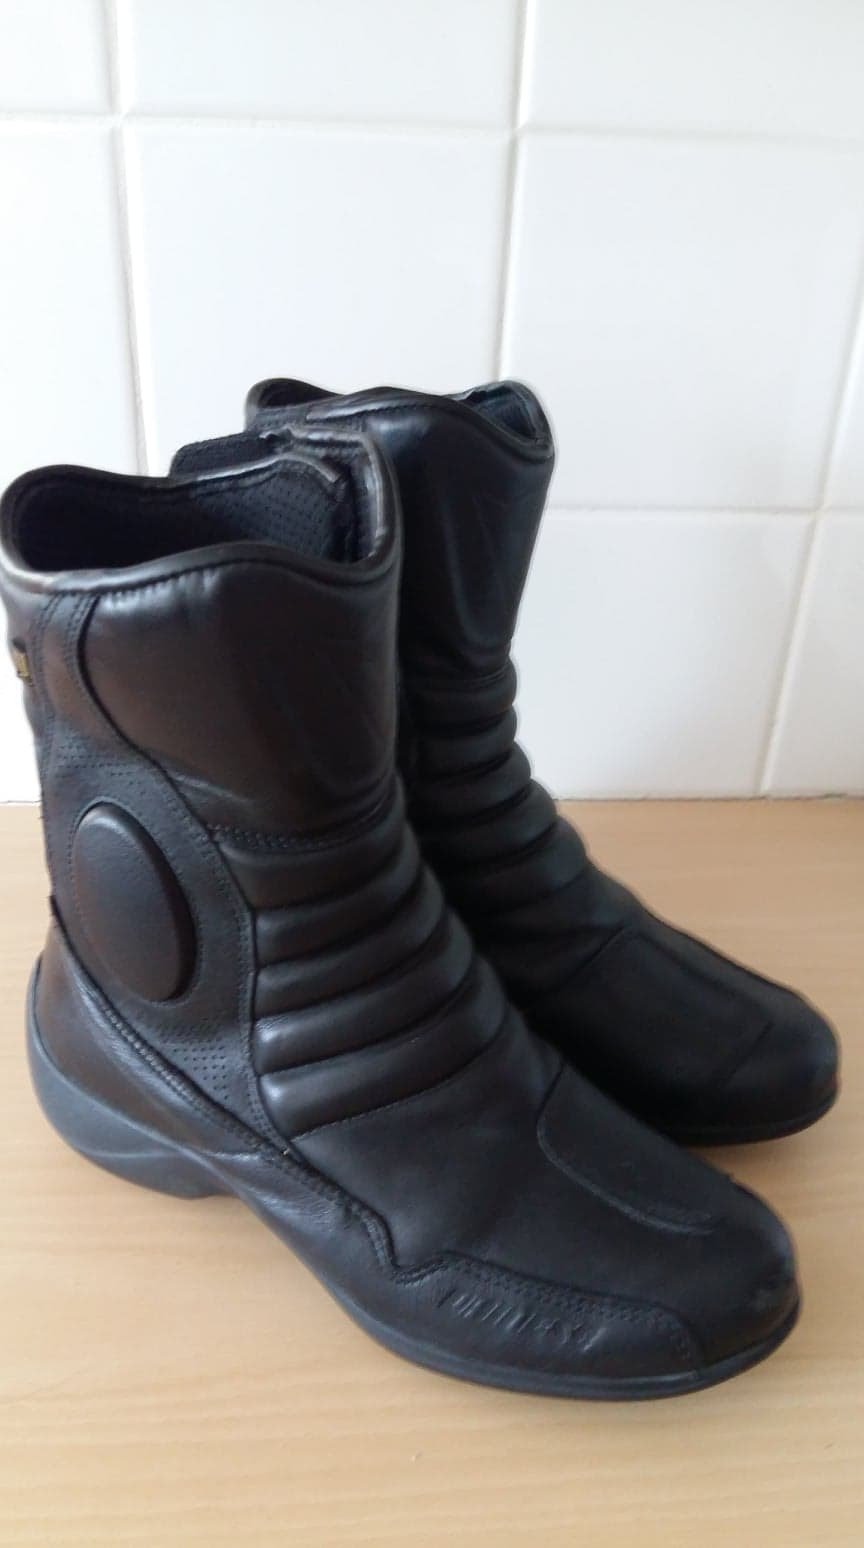 Dainese mc stövlar skor